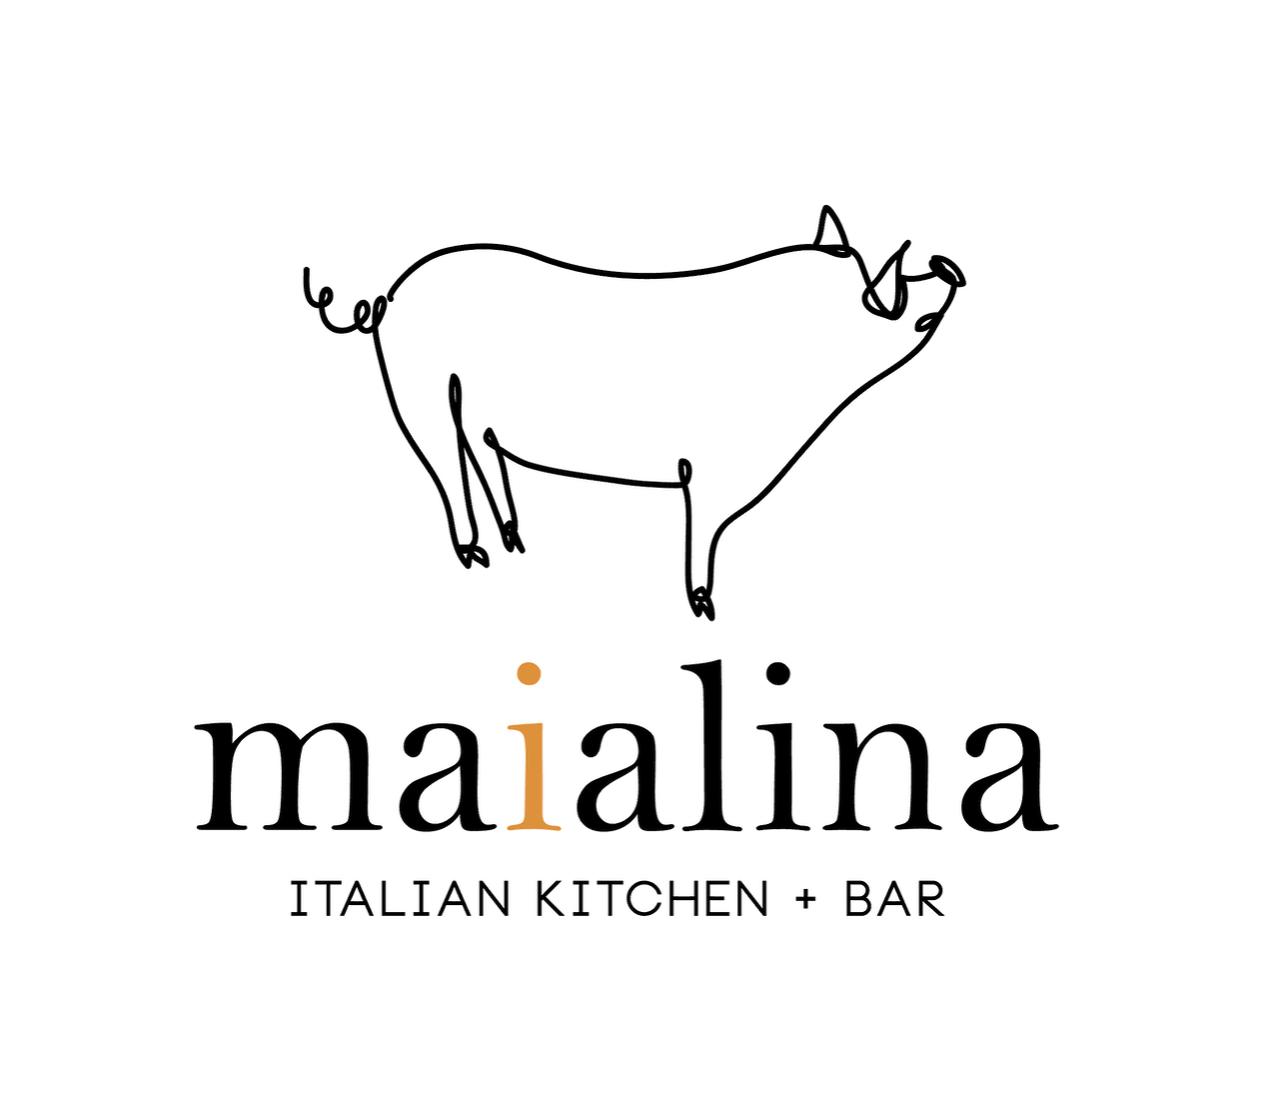 Maialina